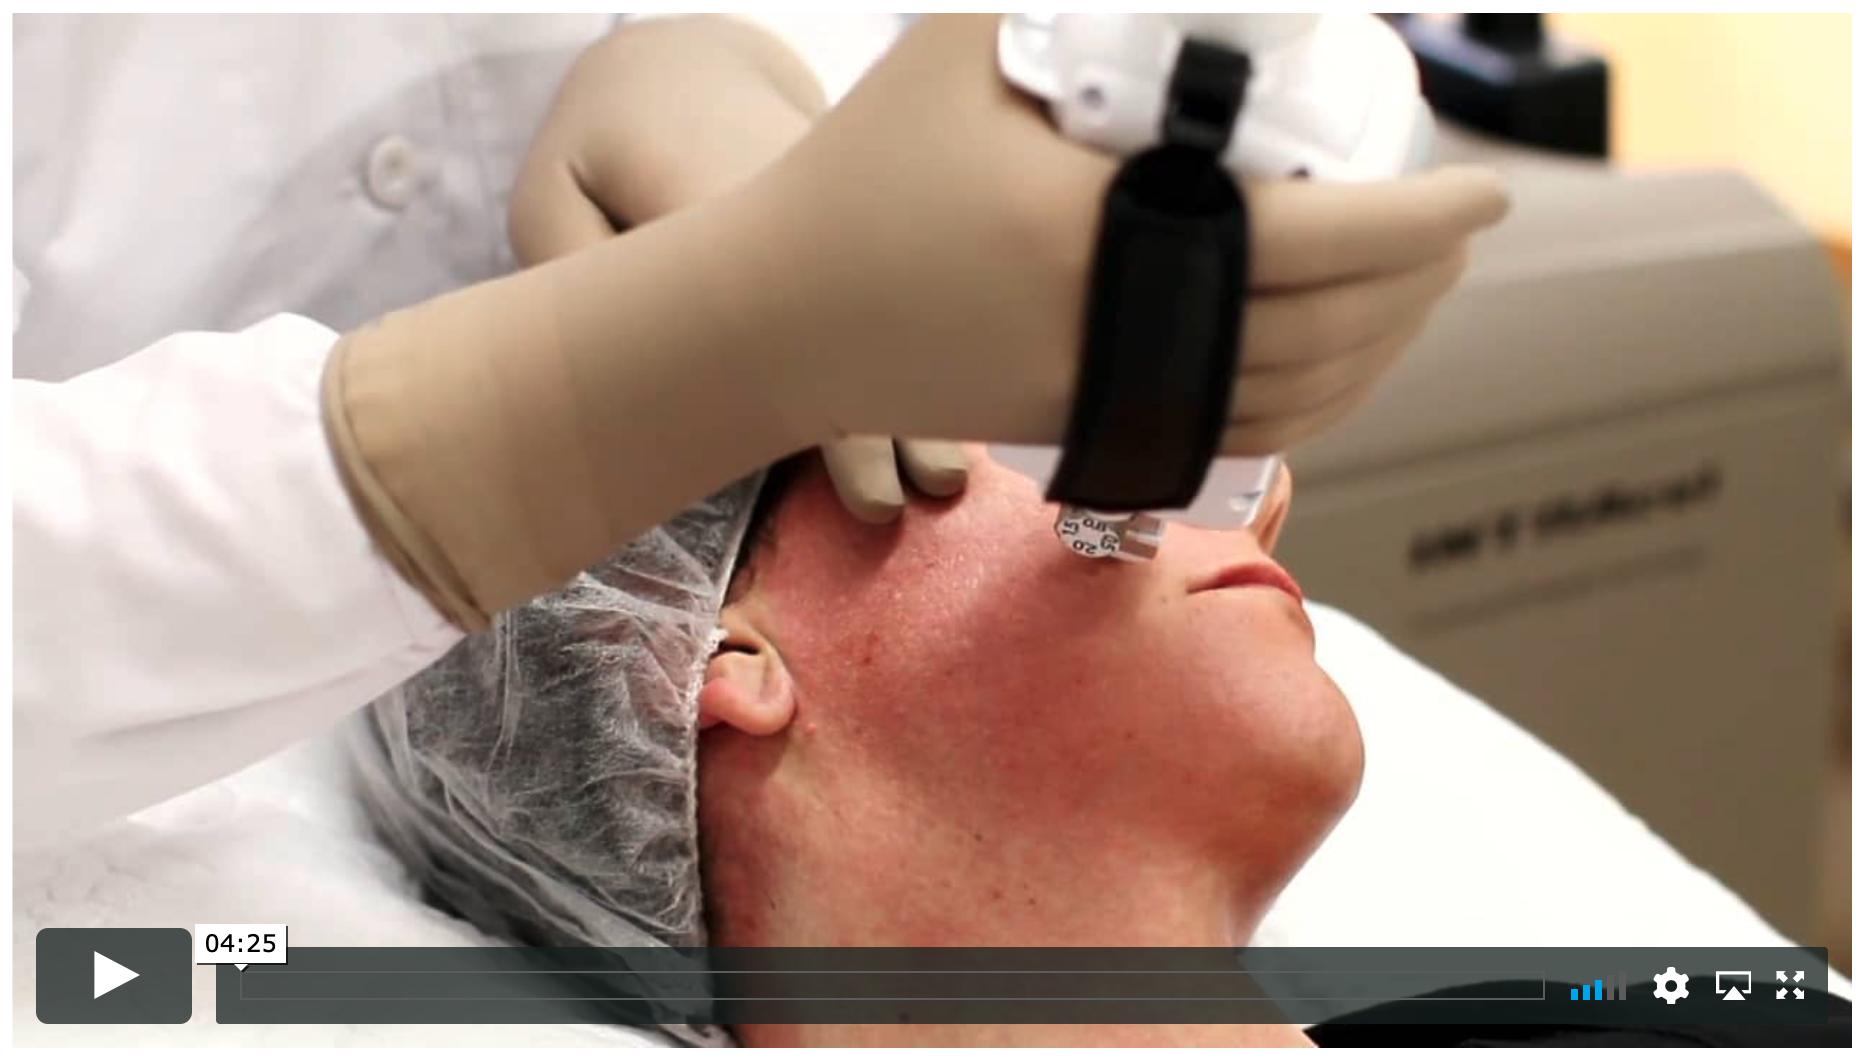 intracel physics video